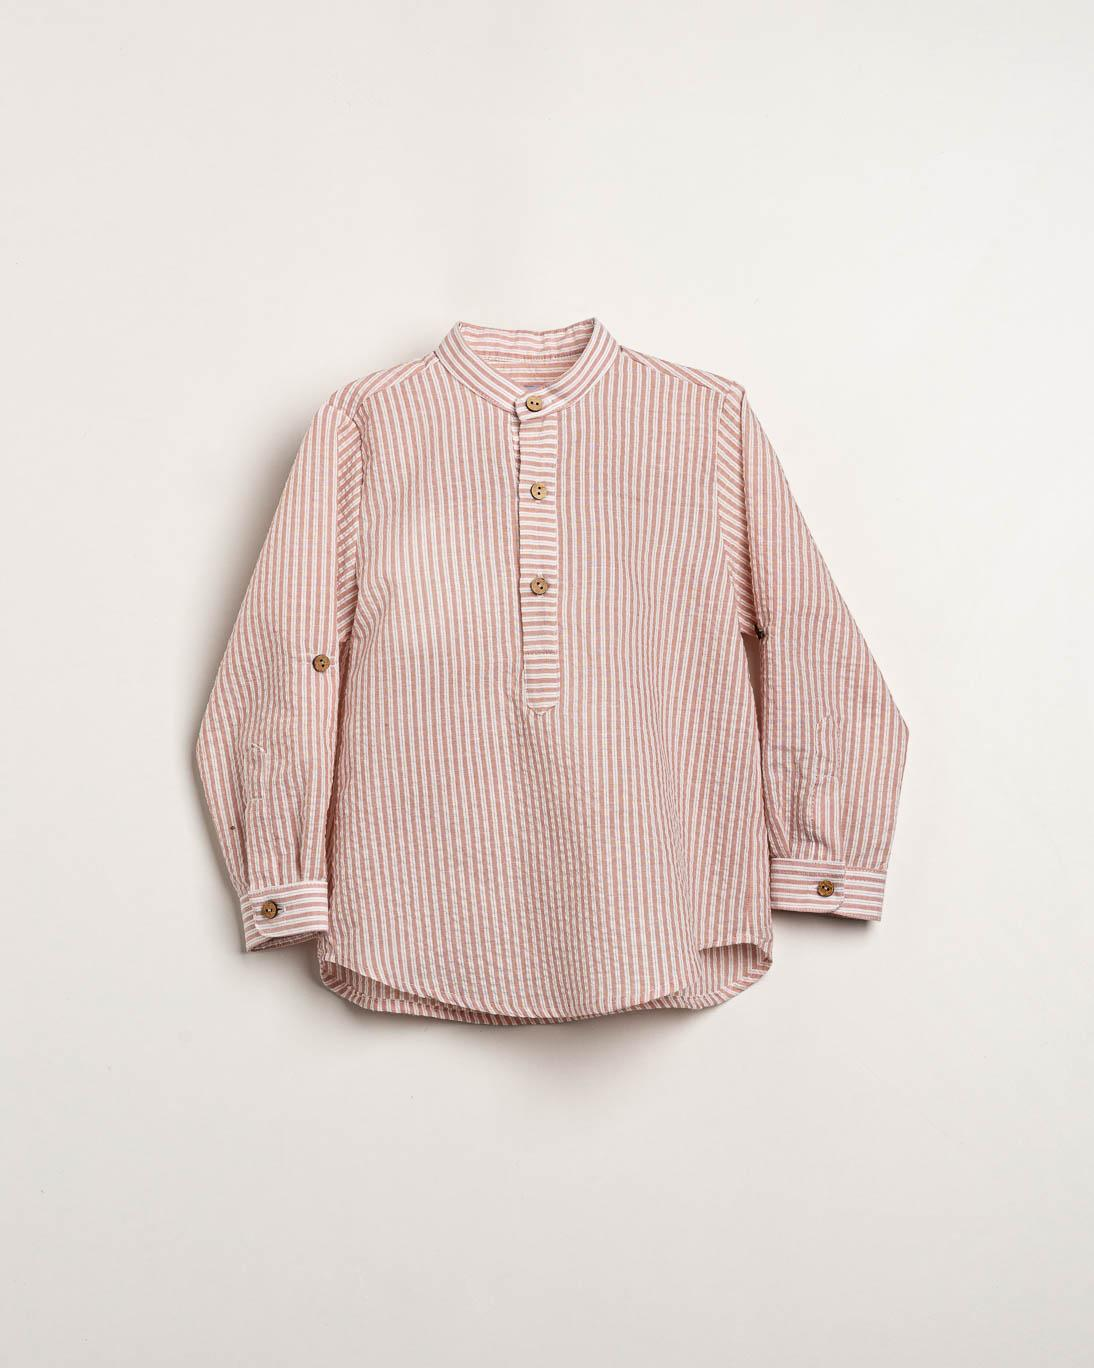 Camisa Ancar niño rayas rosas seersucker.